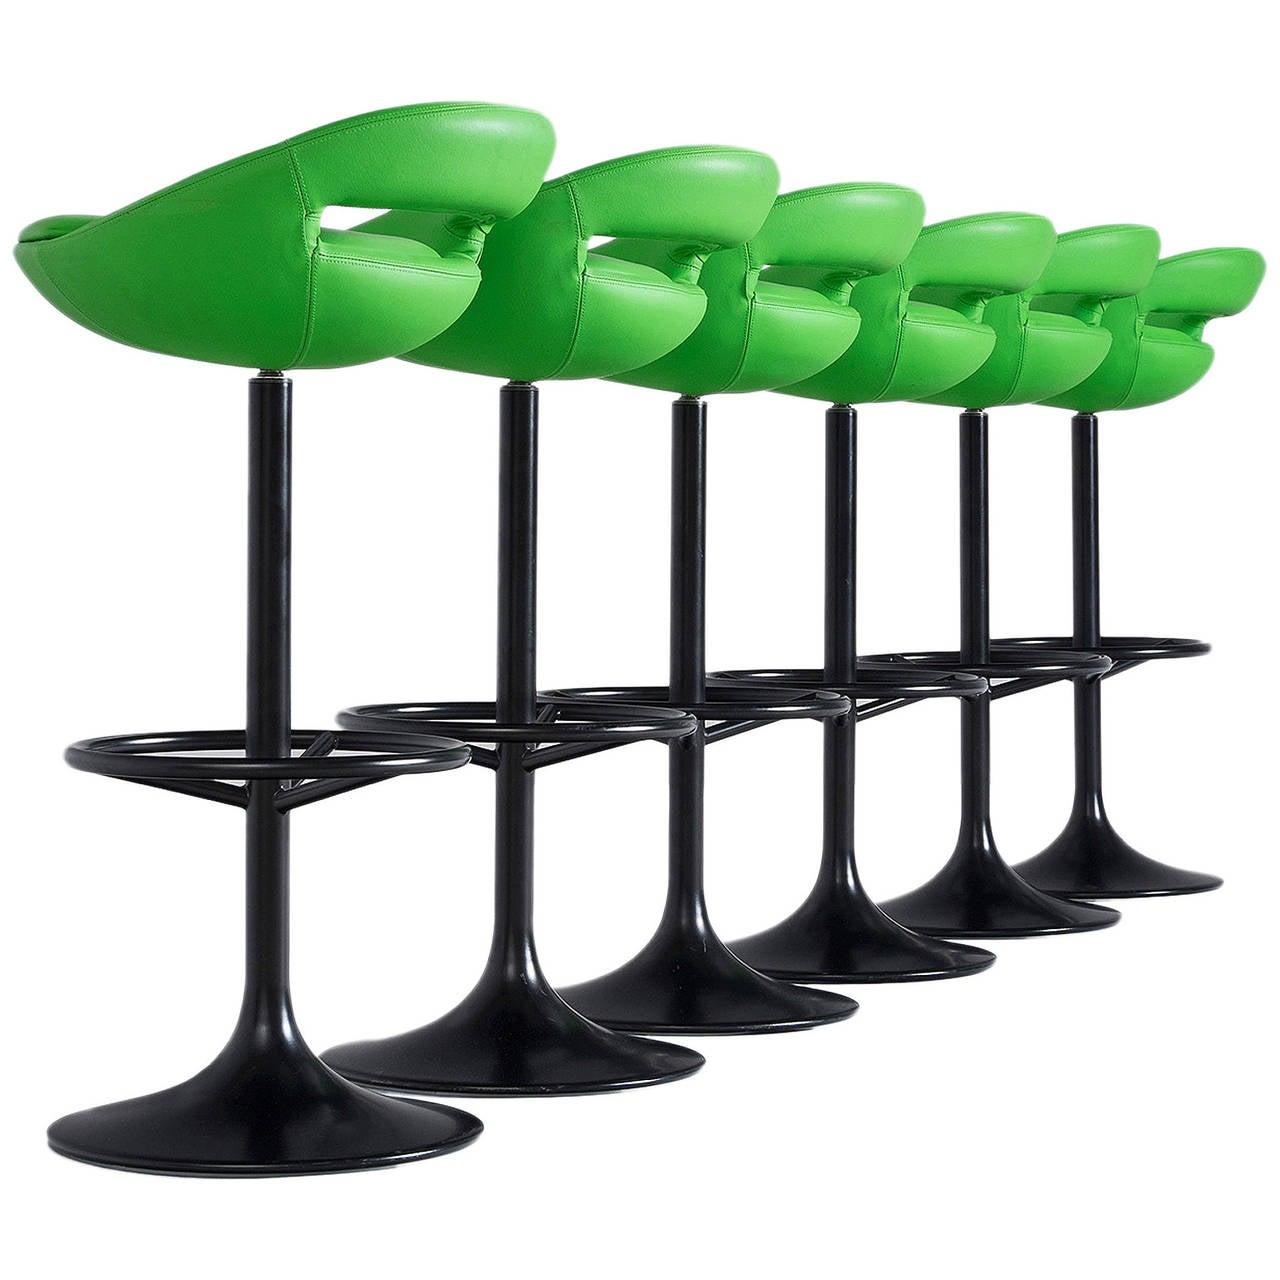 black leather bar stools 120 for sale on 1stdibs